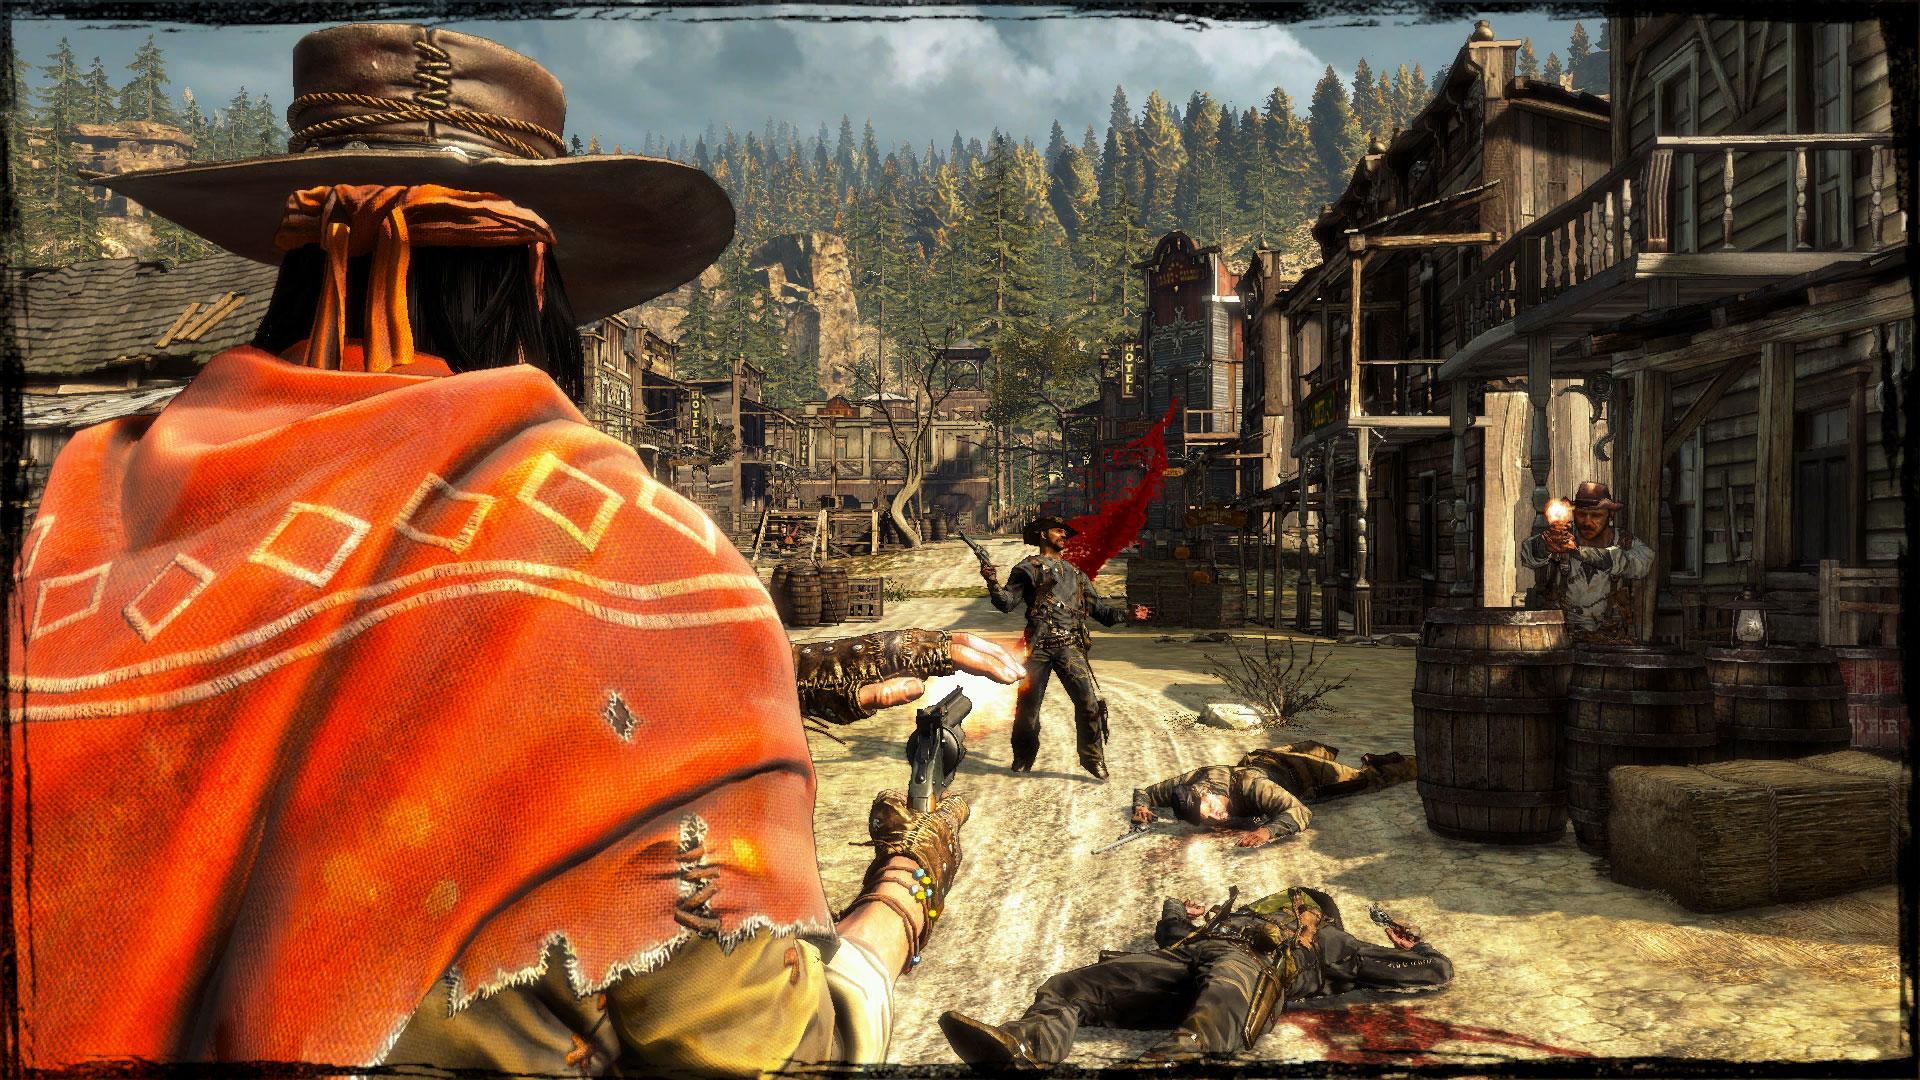 Call of Juarez: Gunslinger - Our selection of « Shoot 'em up » video games